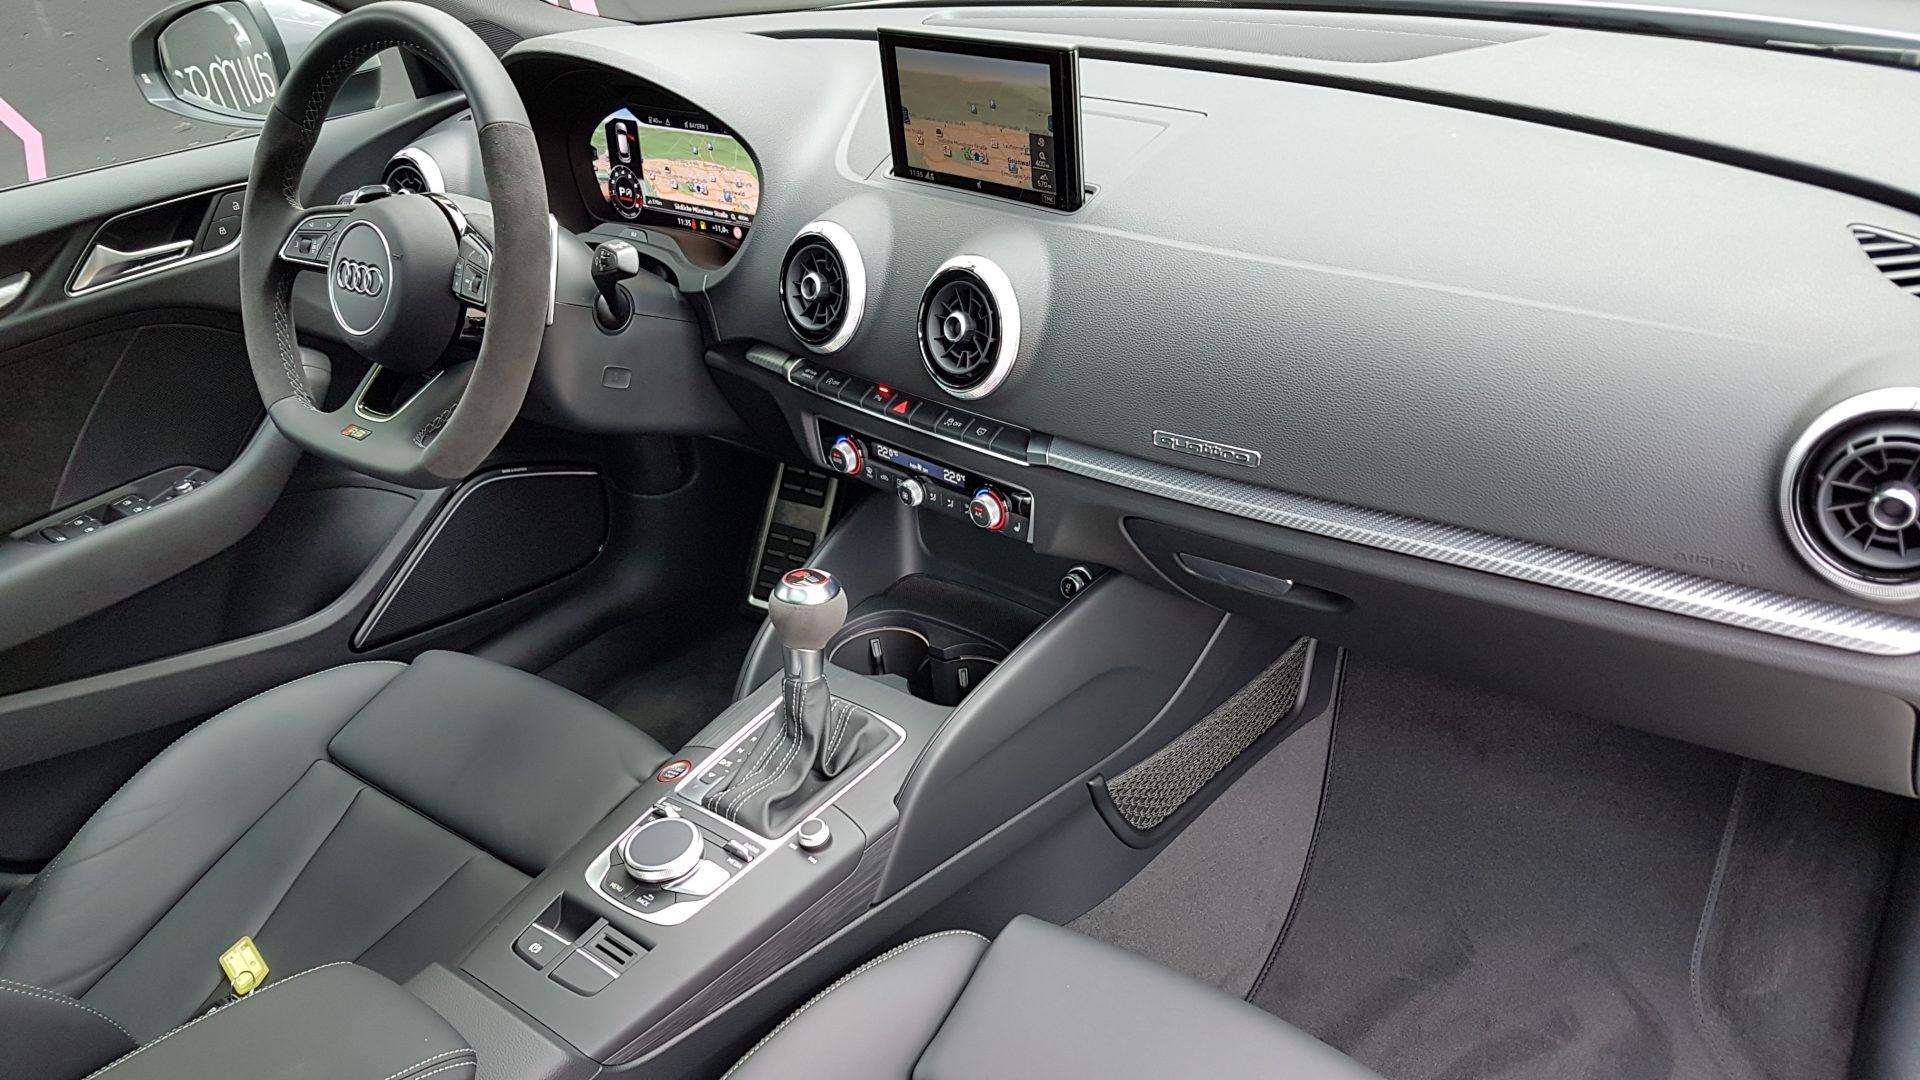 AIL Audi RS3 Sportback Matrix Virtual Panorama 12